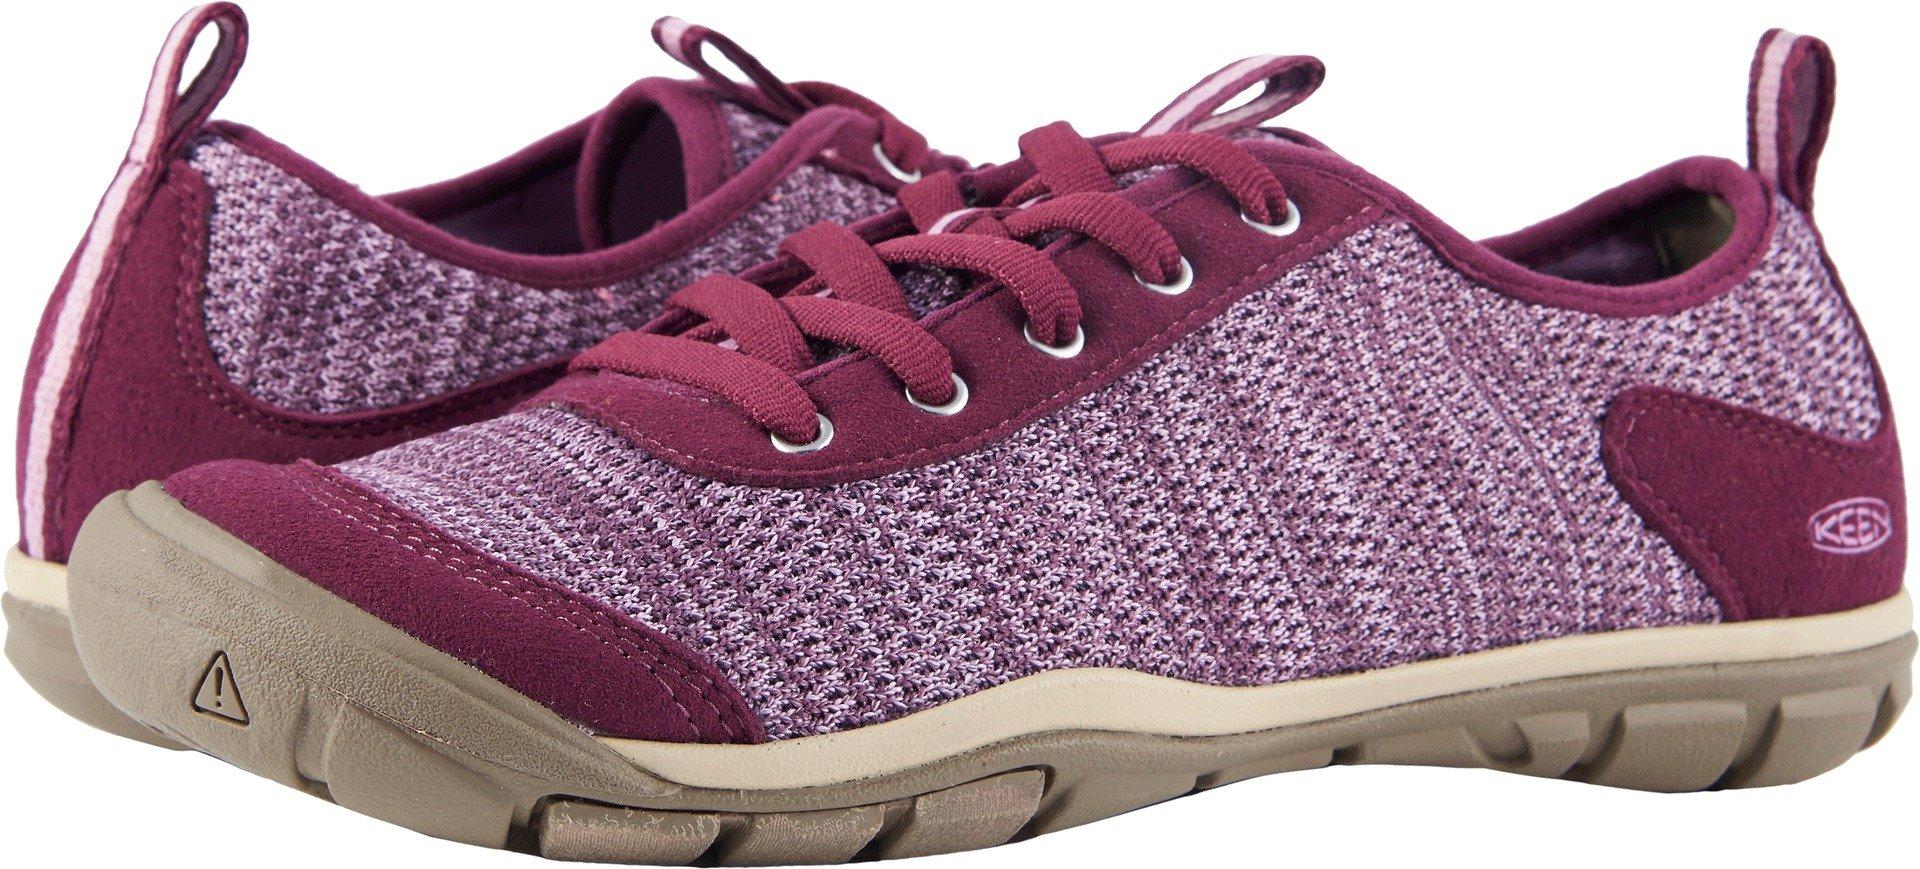 KEEN Women's Hush Knit-W Hiking Shoe, Grape Wine/Lavender Herb, 8.5 M US